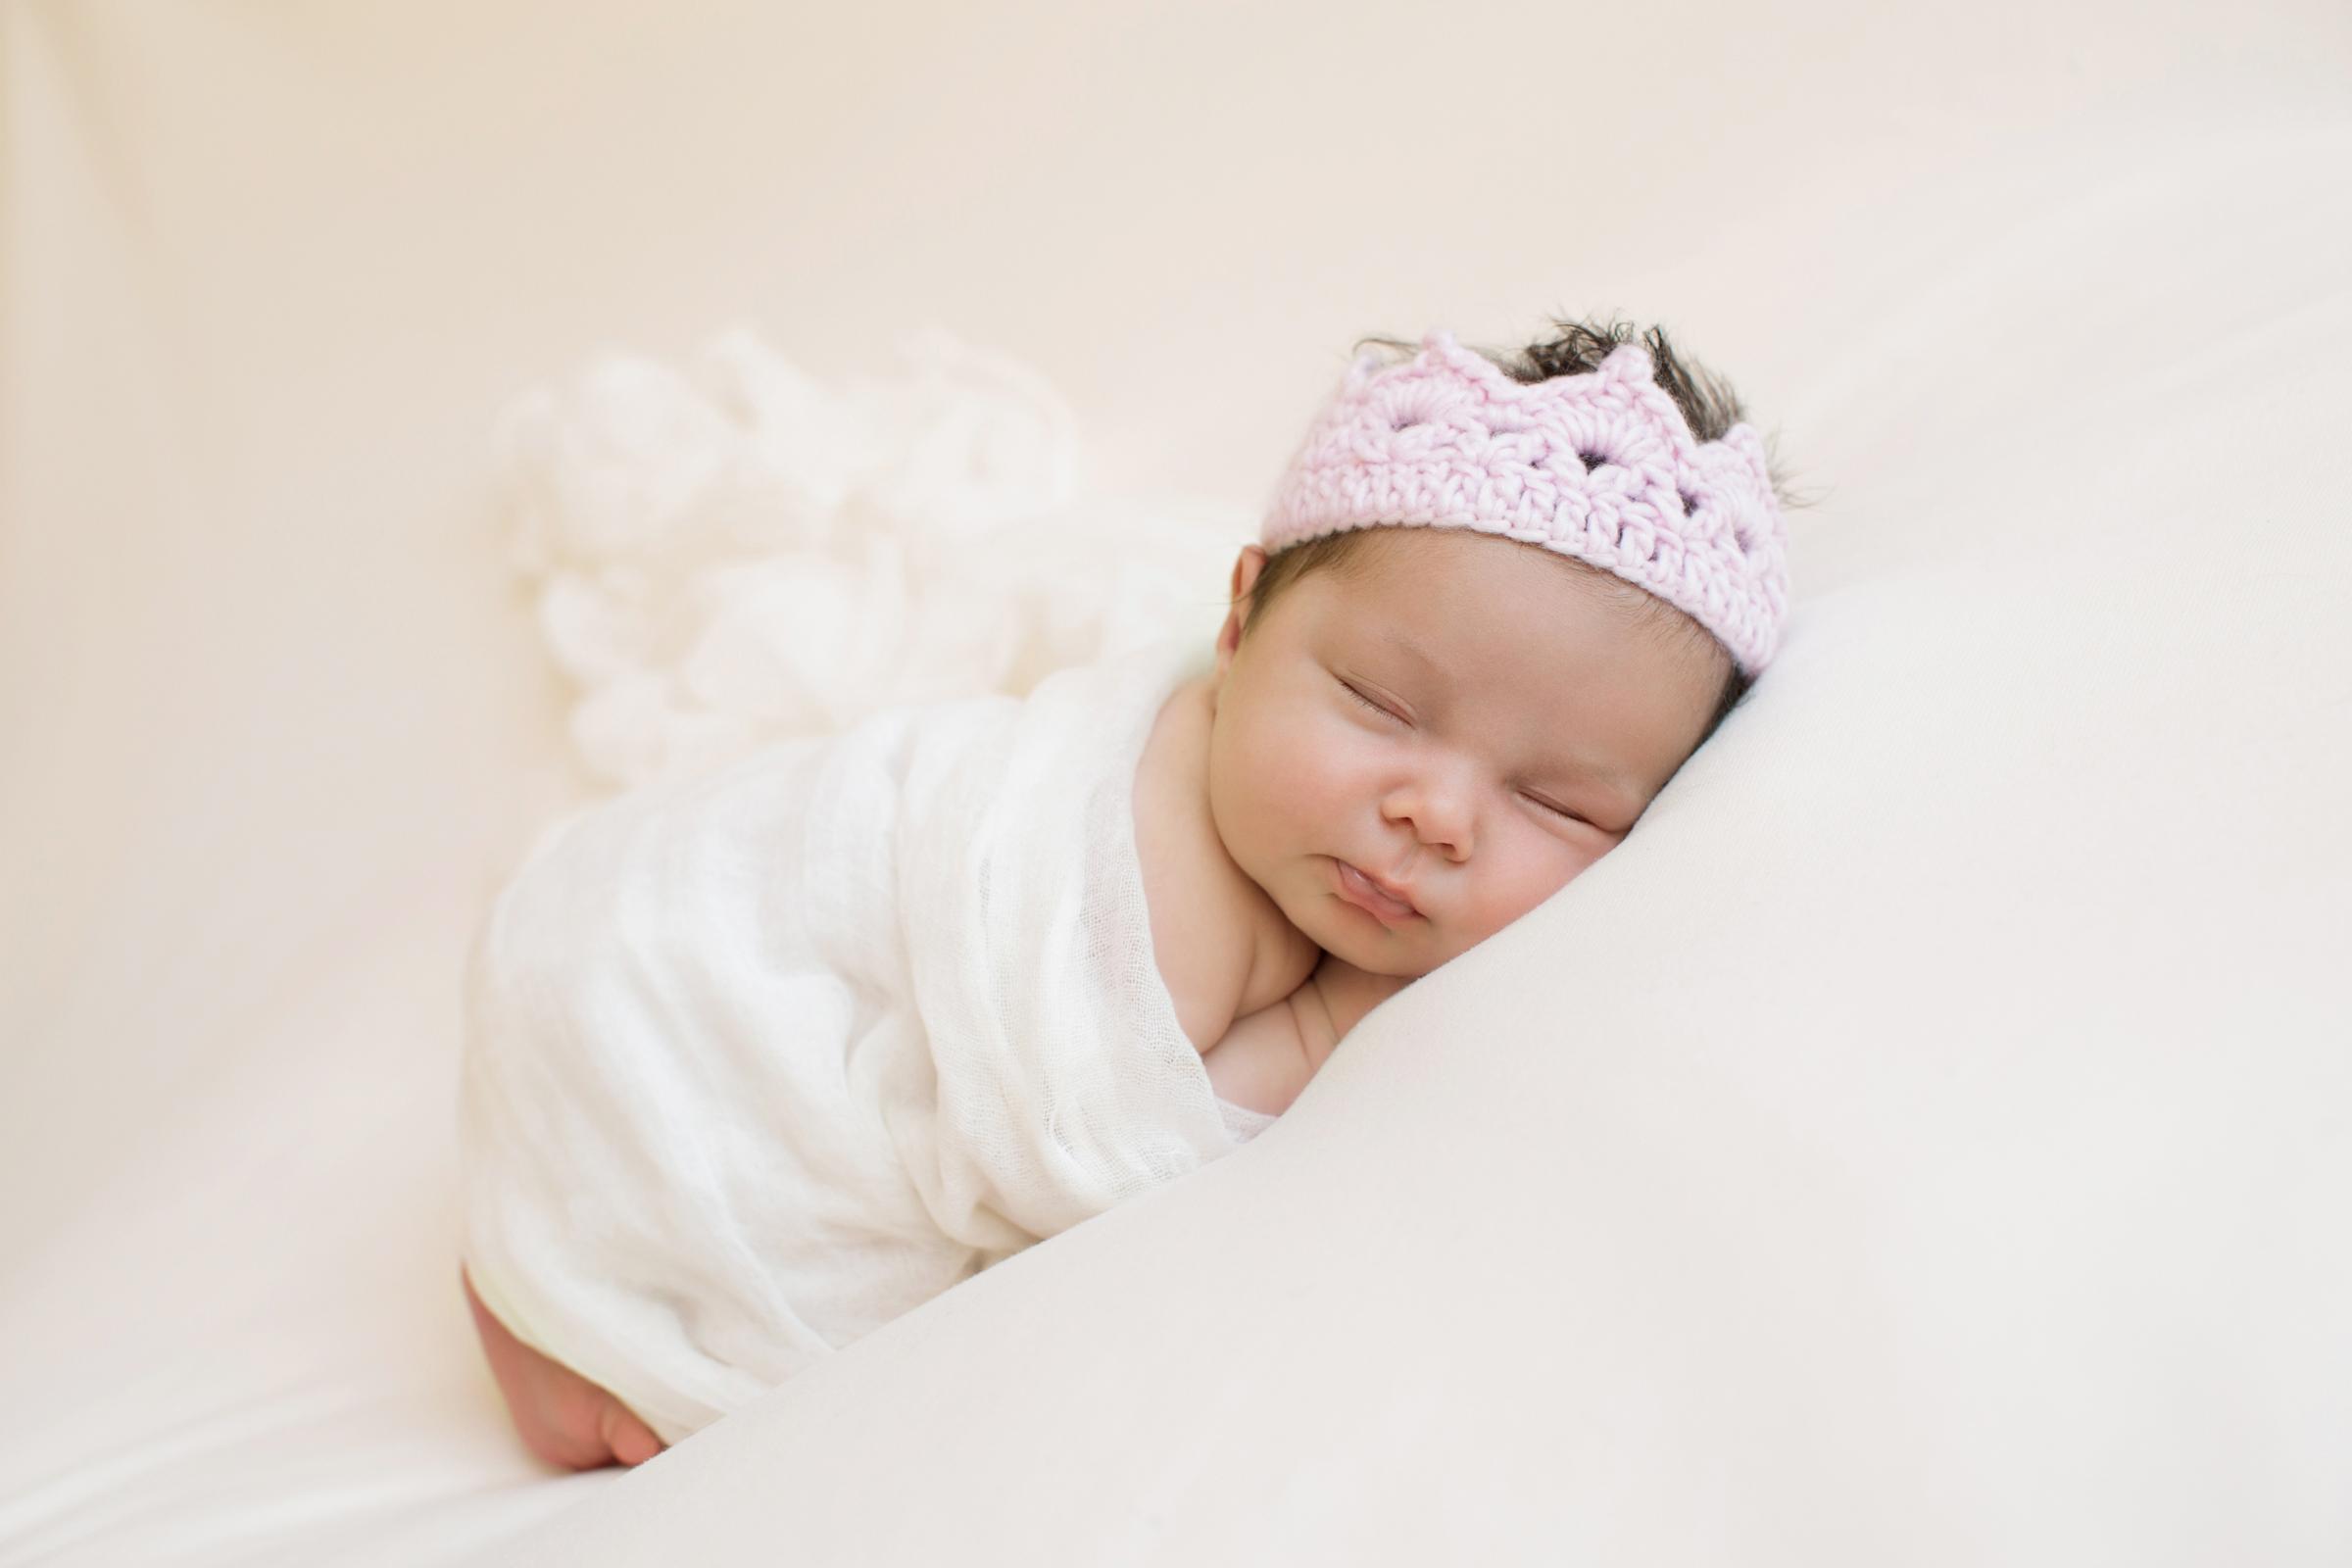 newborn-baby-girl-crowned.jpg